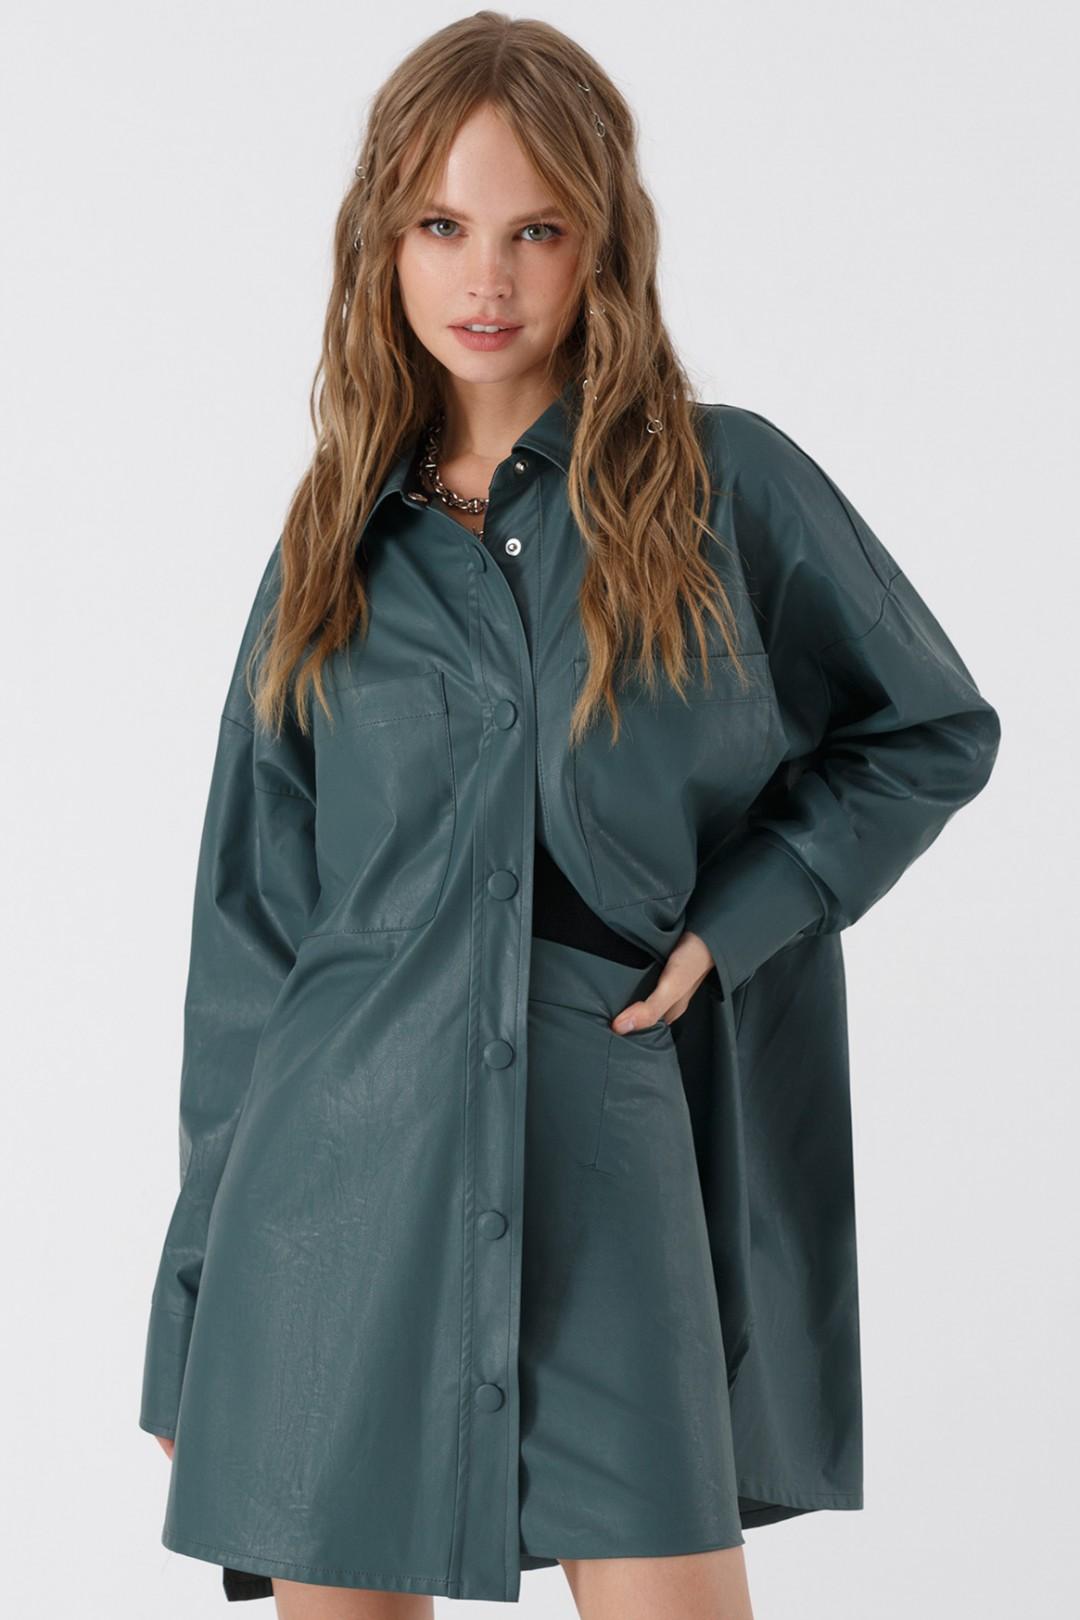 Рубашка Pirs 3396 серо-зеленый